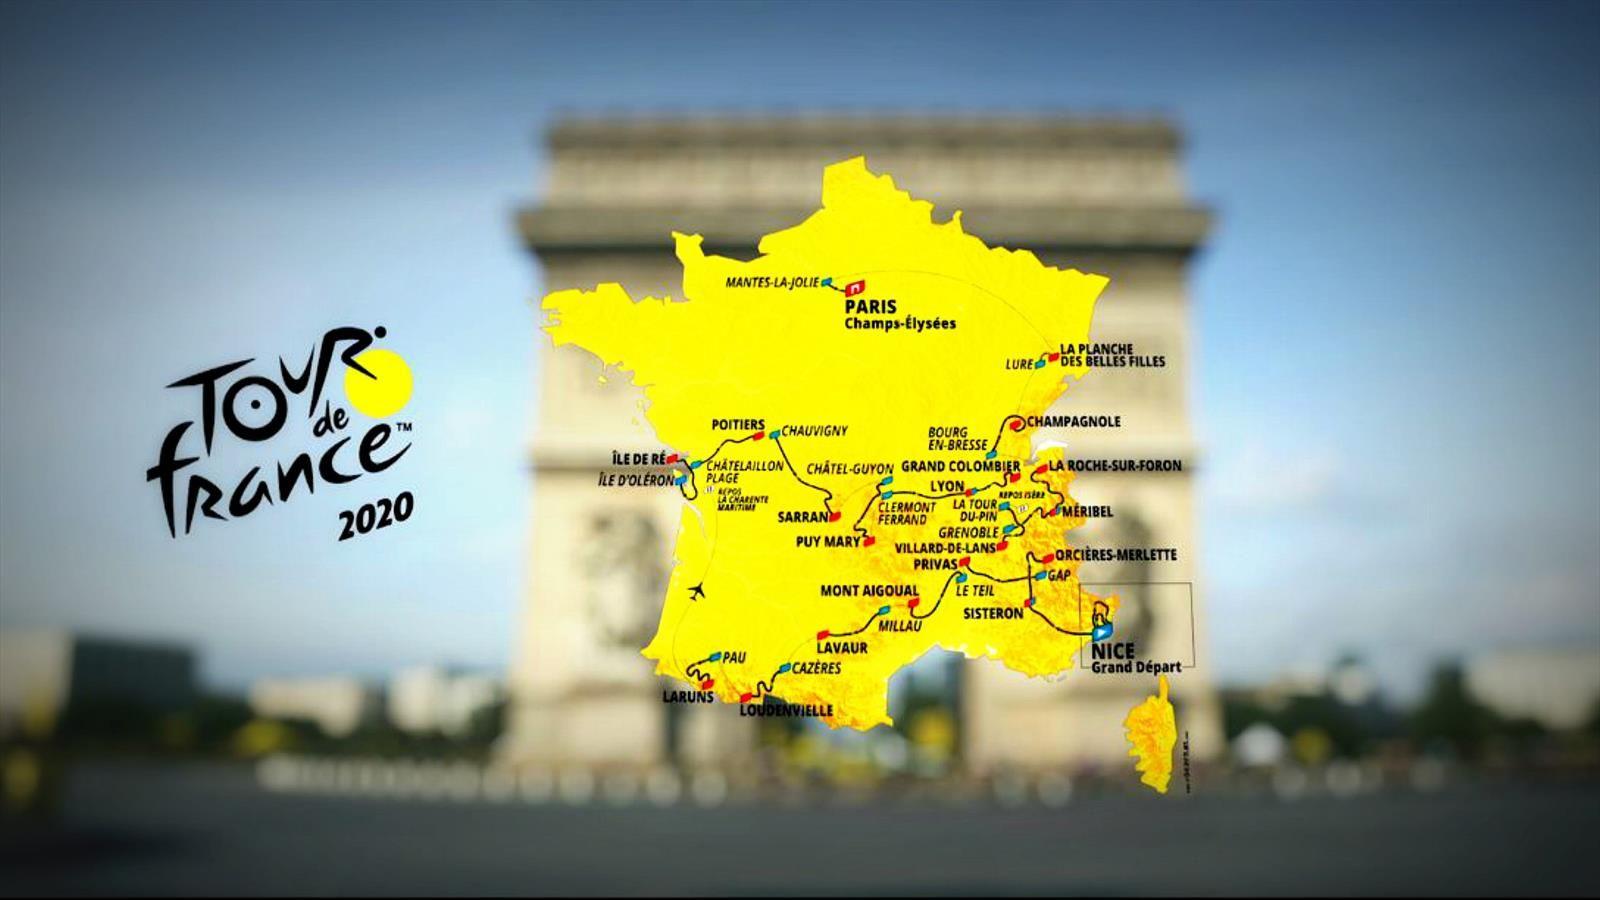 Capovelo Com Wildcard Teams Announced For 2020 Tour De France